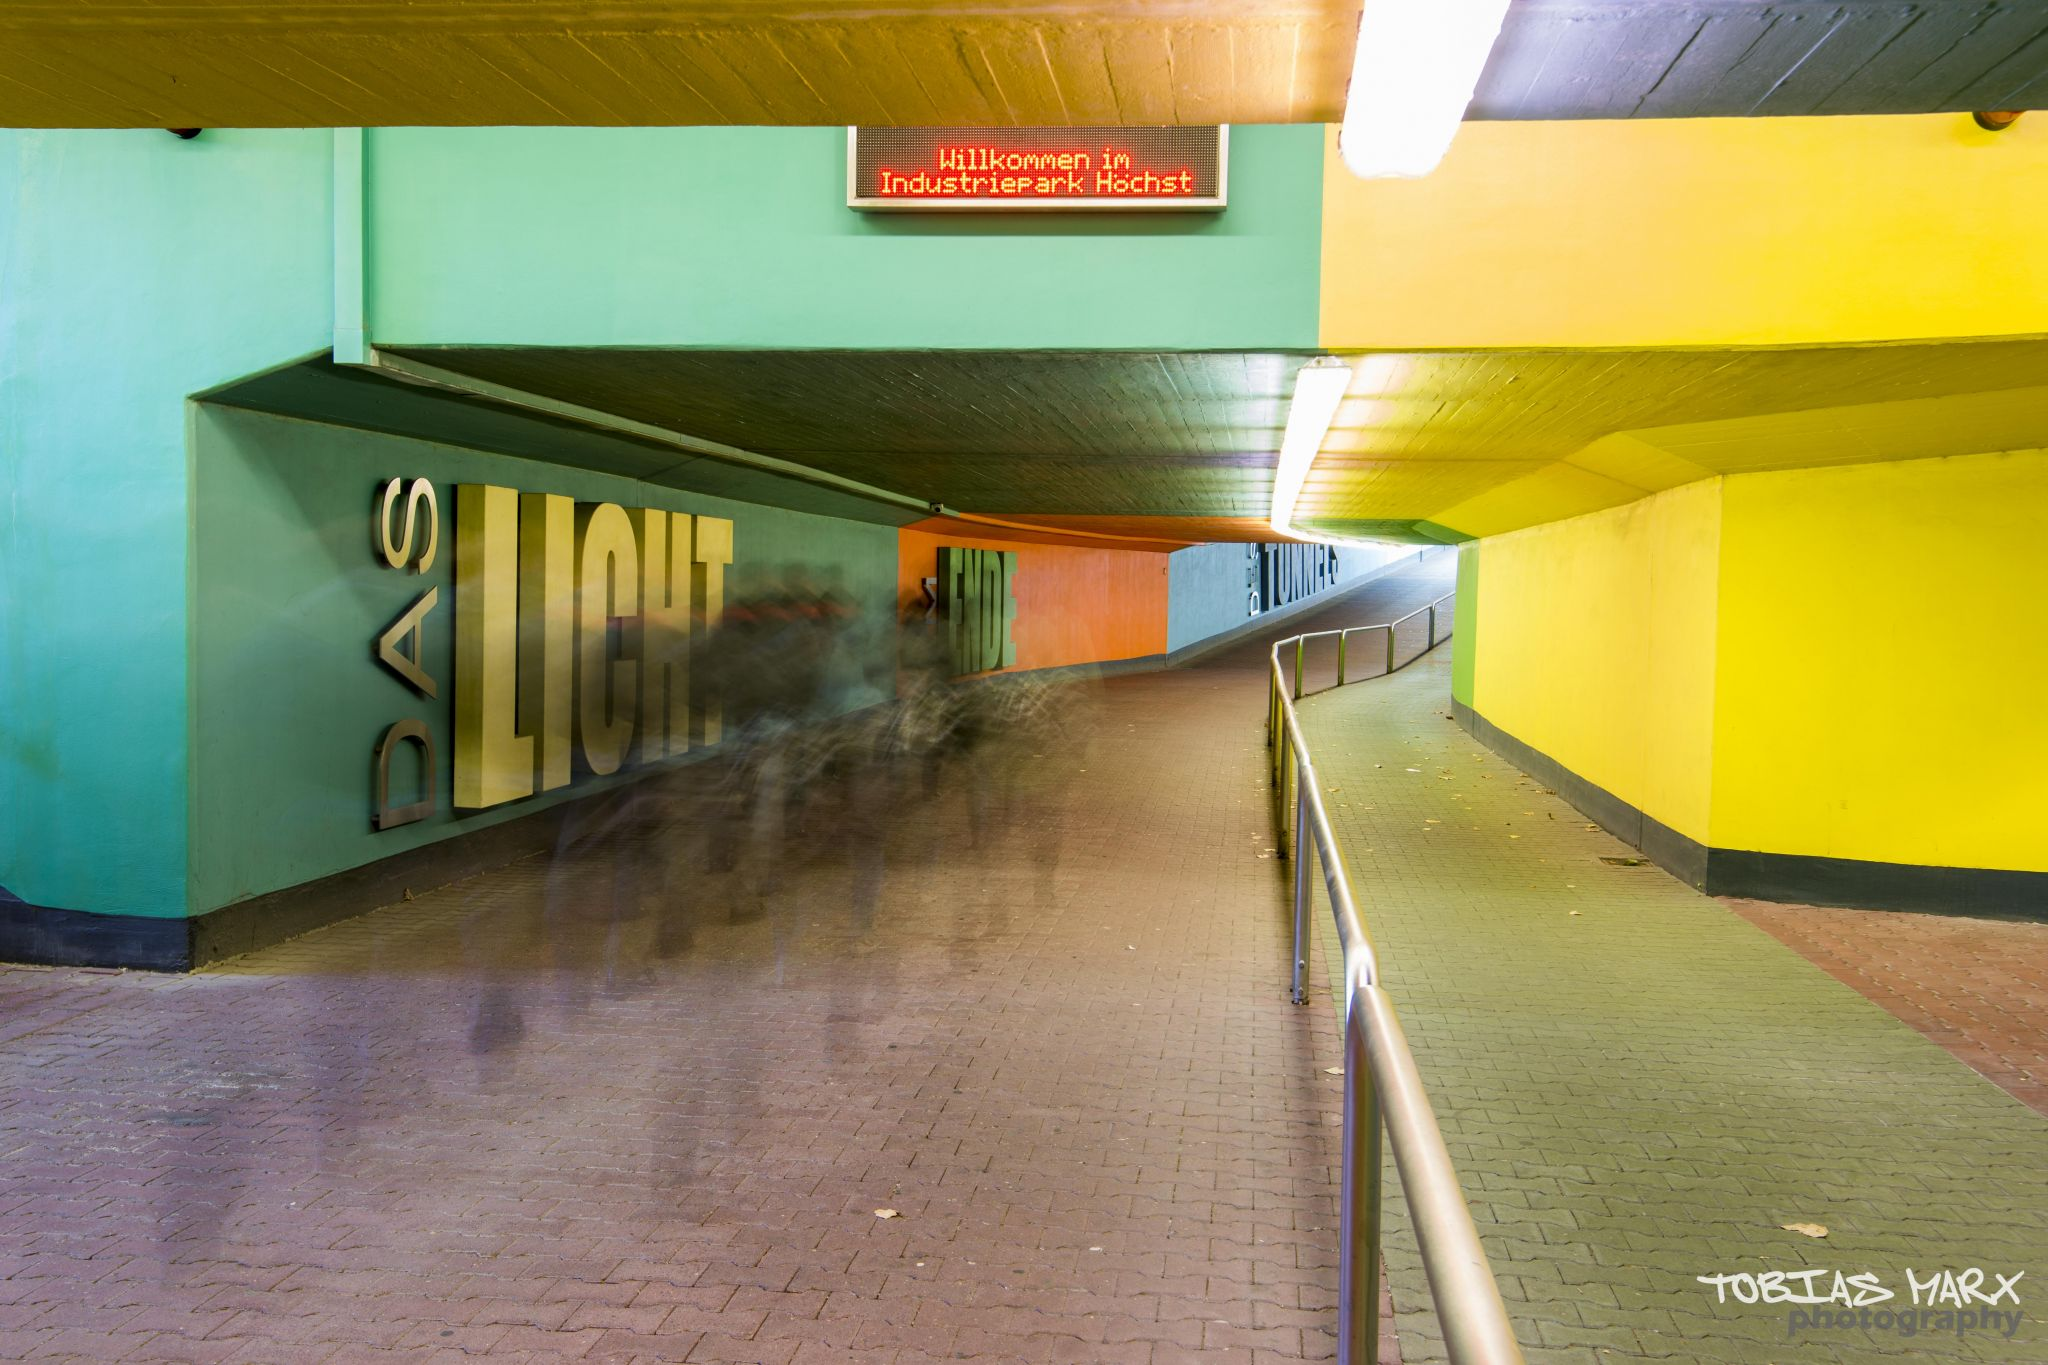 subway 'Farbwerke Höchst', Germany